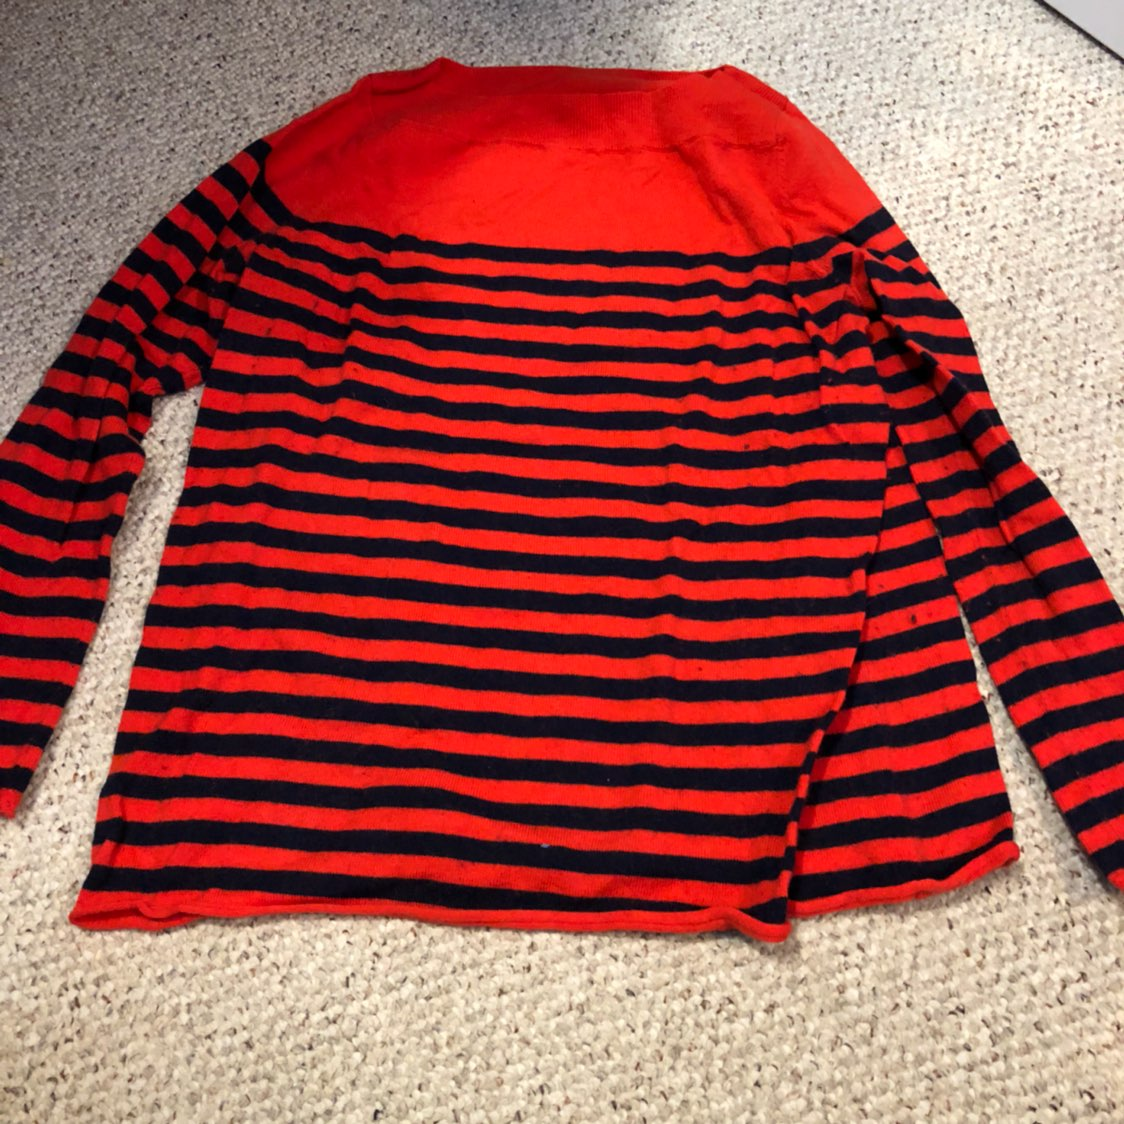 Orange & Navy Striped Sweater Boat Neck - Mercari: BUY & SELL ...